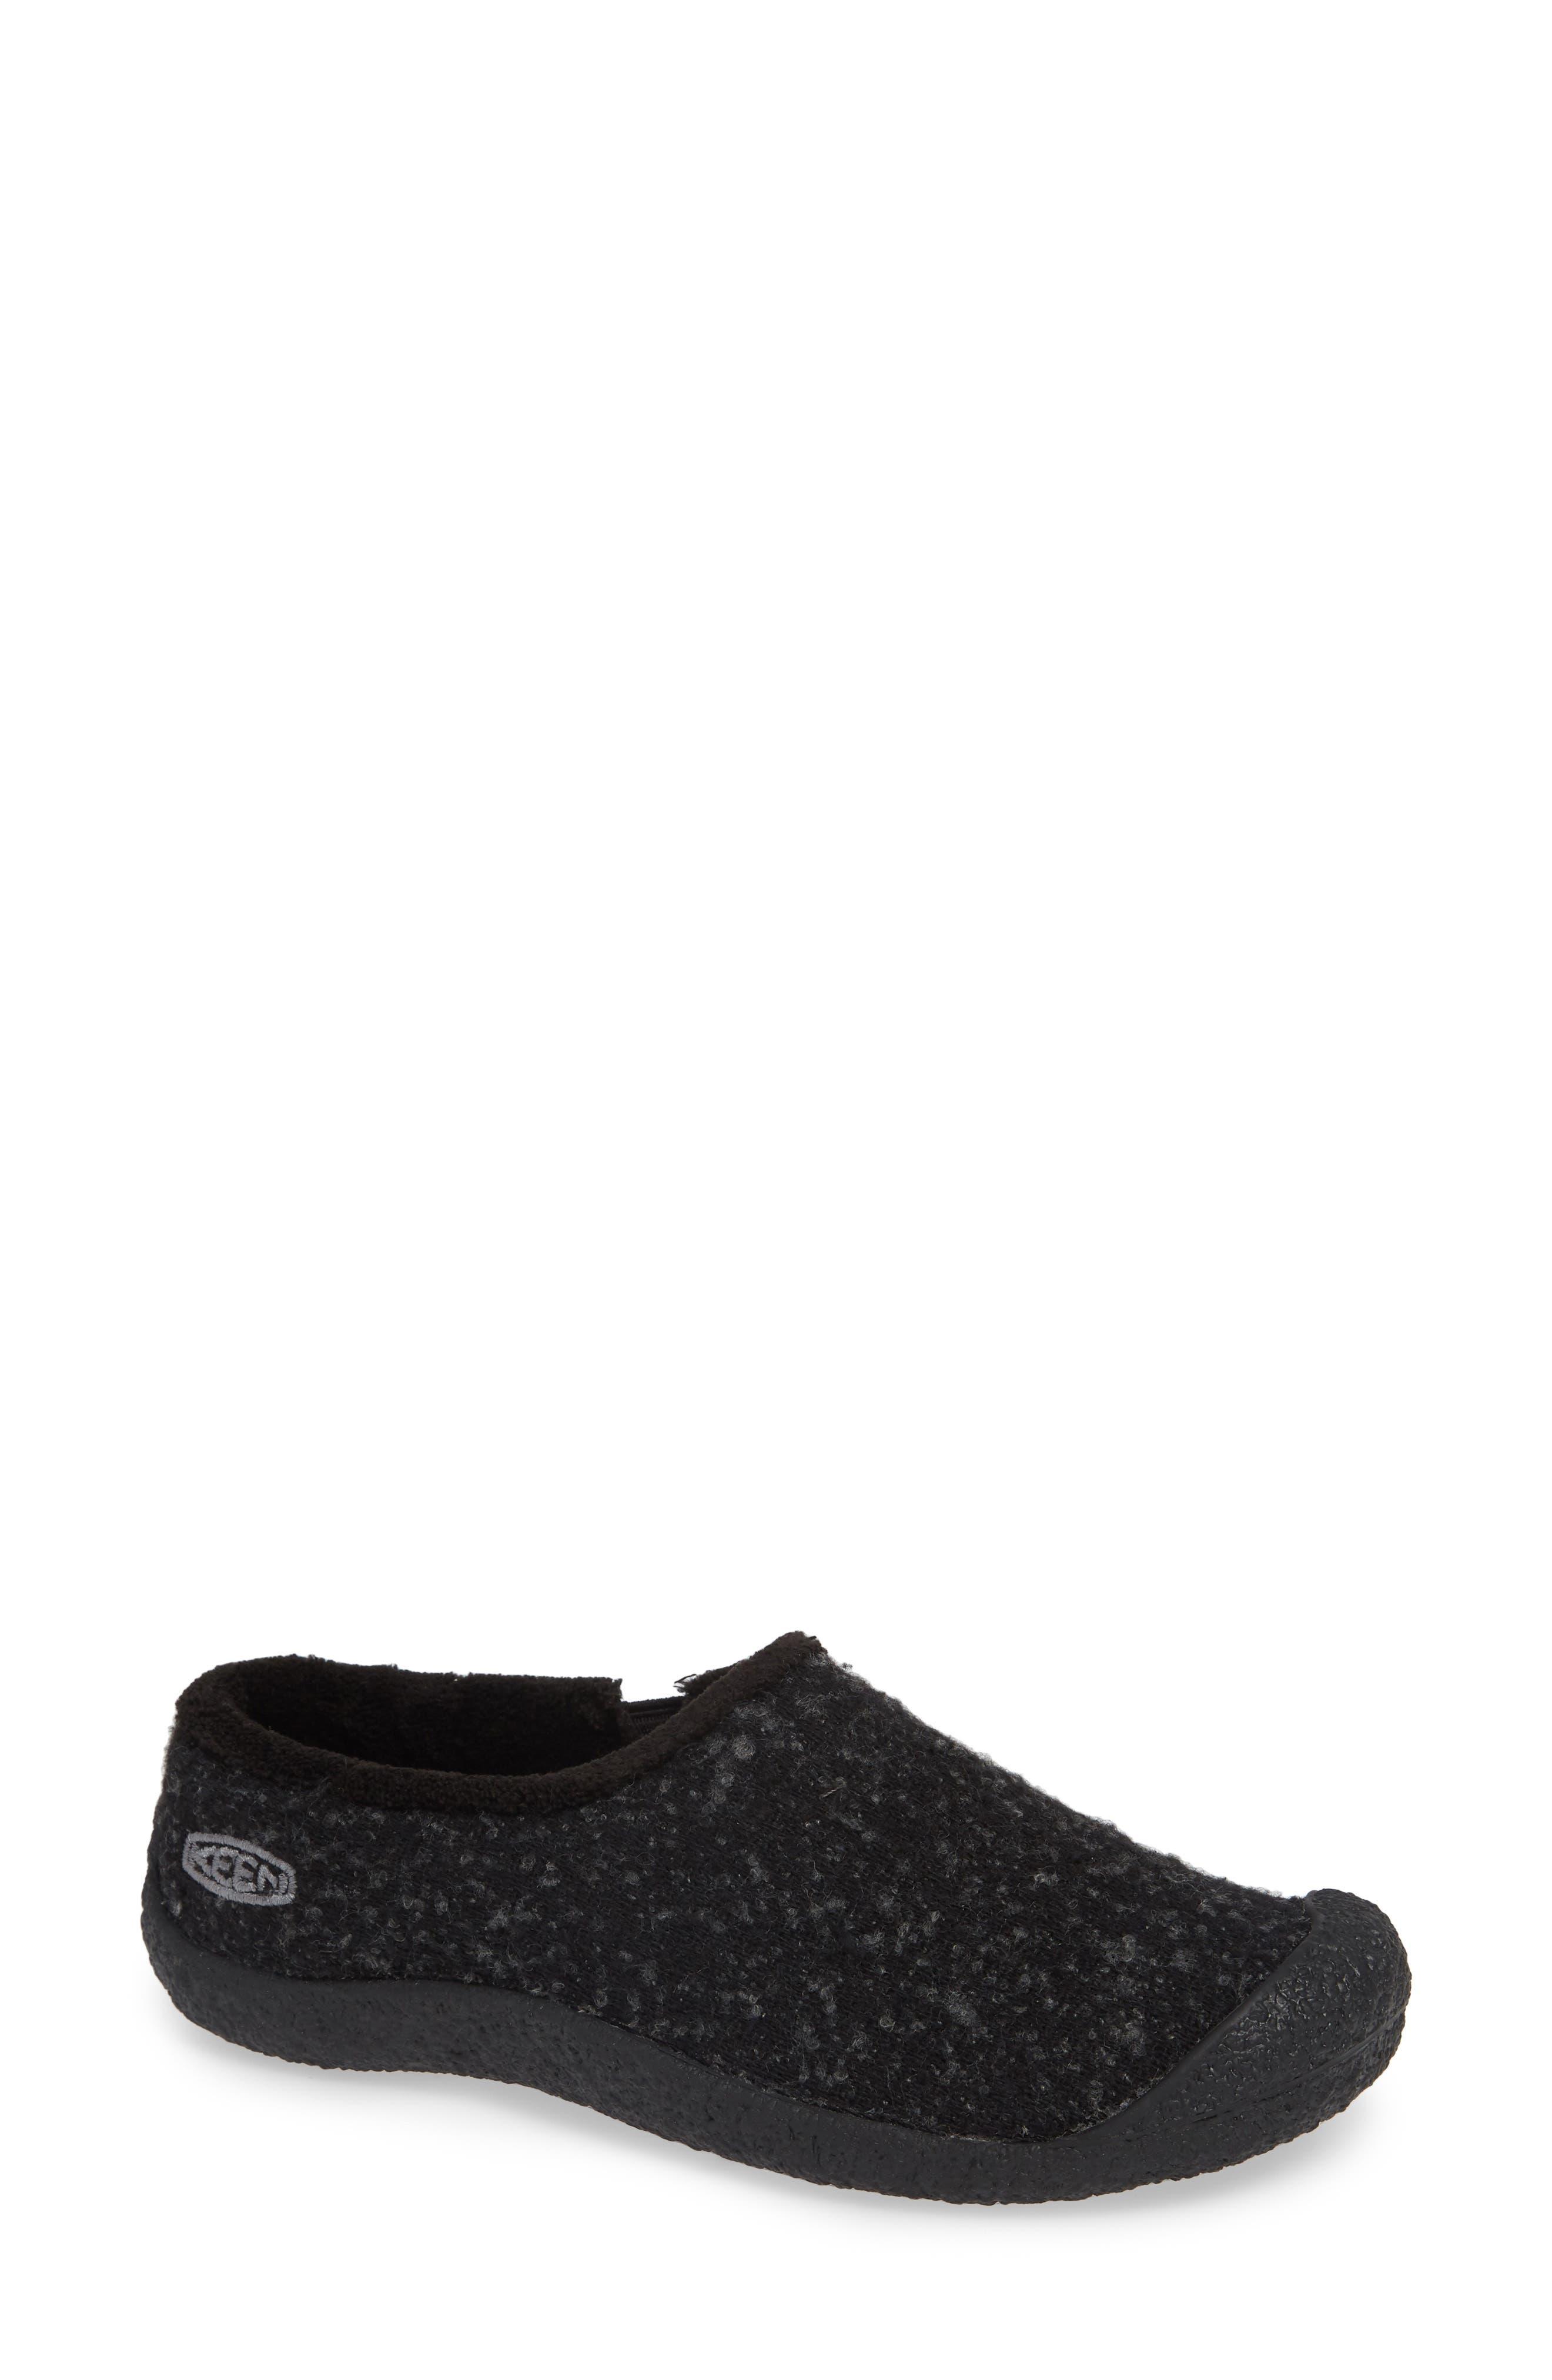 Keen Howser Round Toe Wool Slip-On, Black